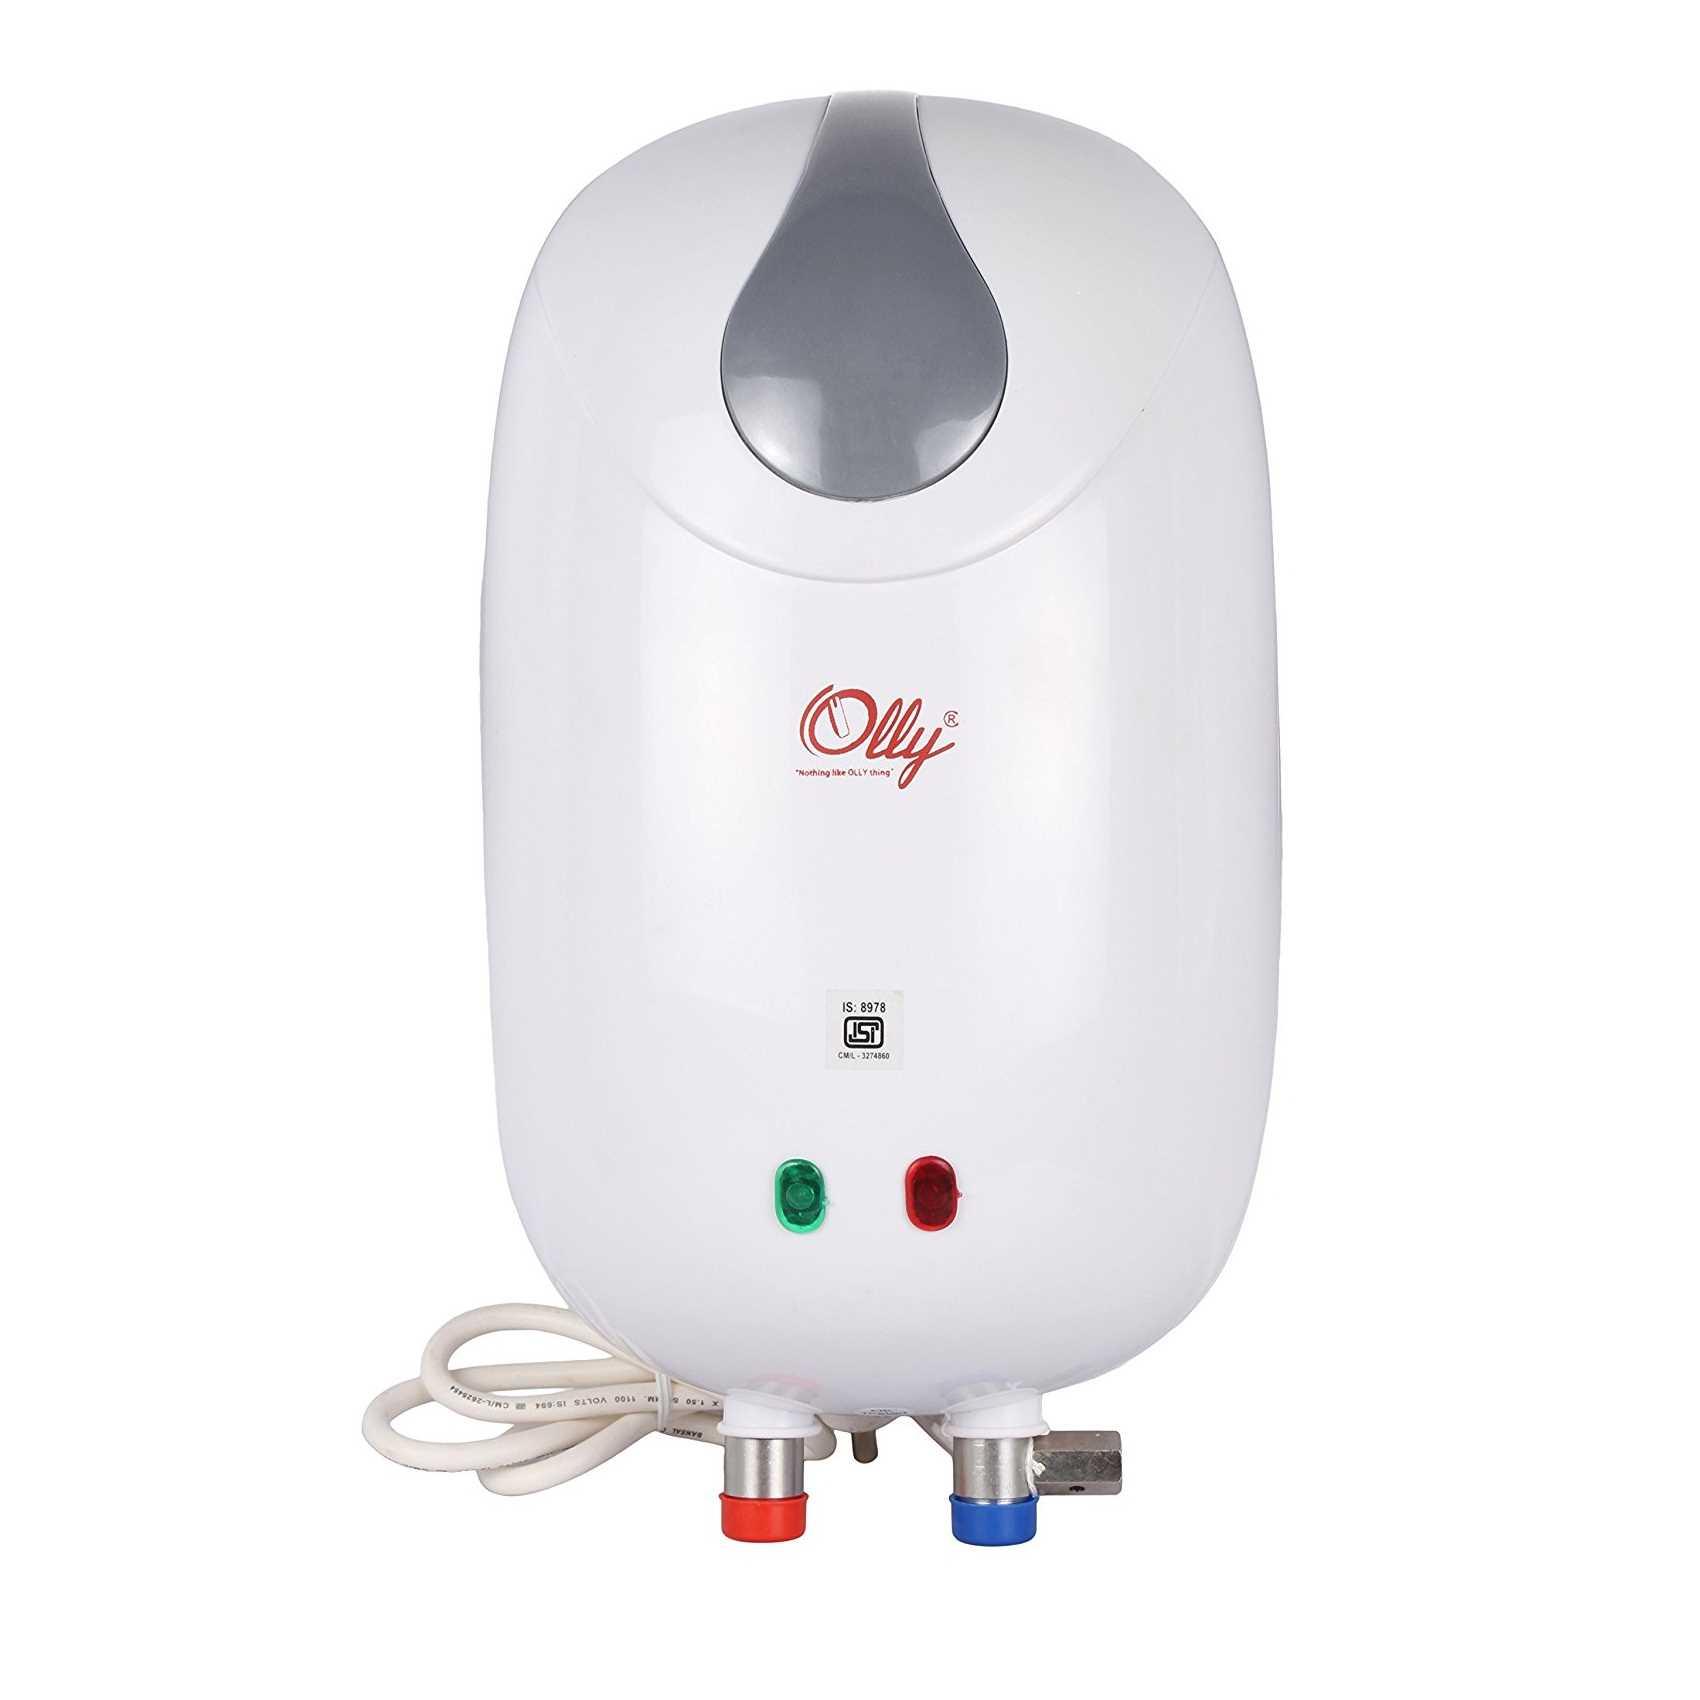 Olly Diamond EBS-02 3 Litre Storage Water Heater